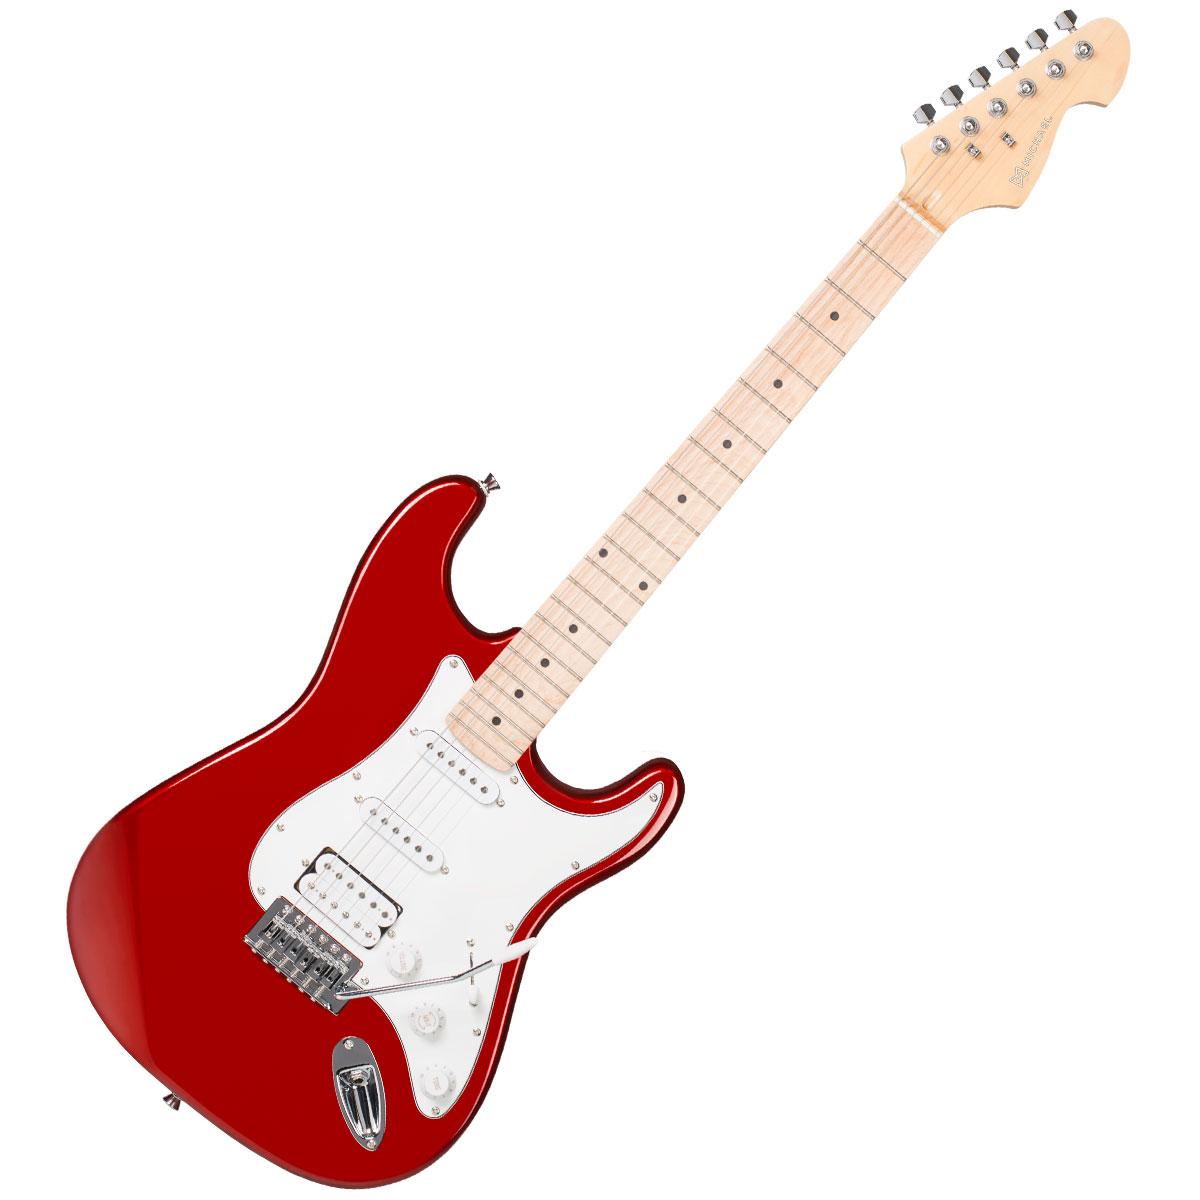 Guitarra Strato Power Advanced GM237 MR Vermelha Metálica - Michael